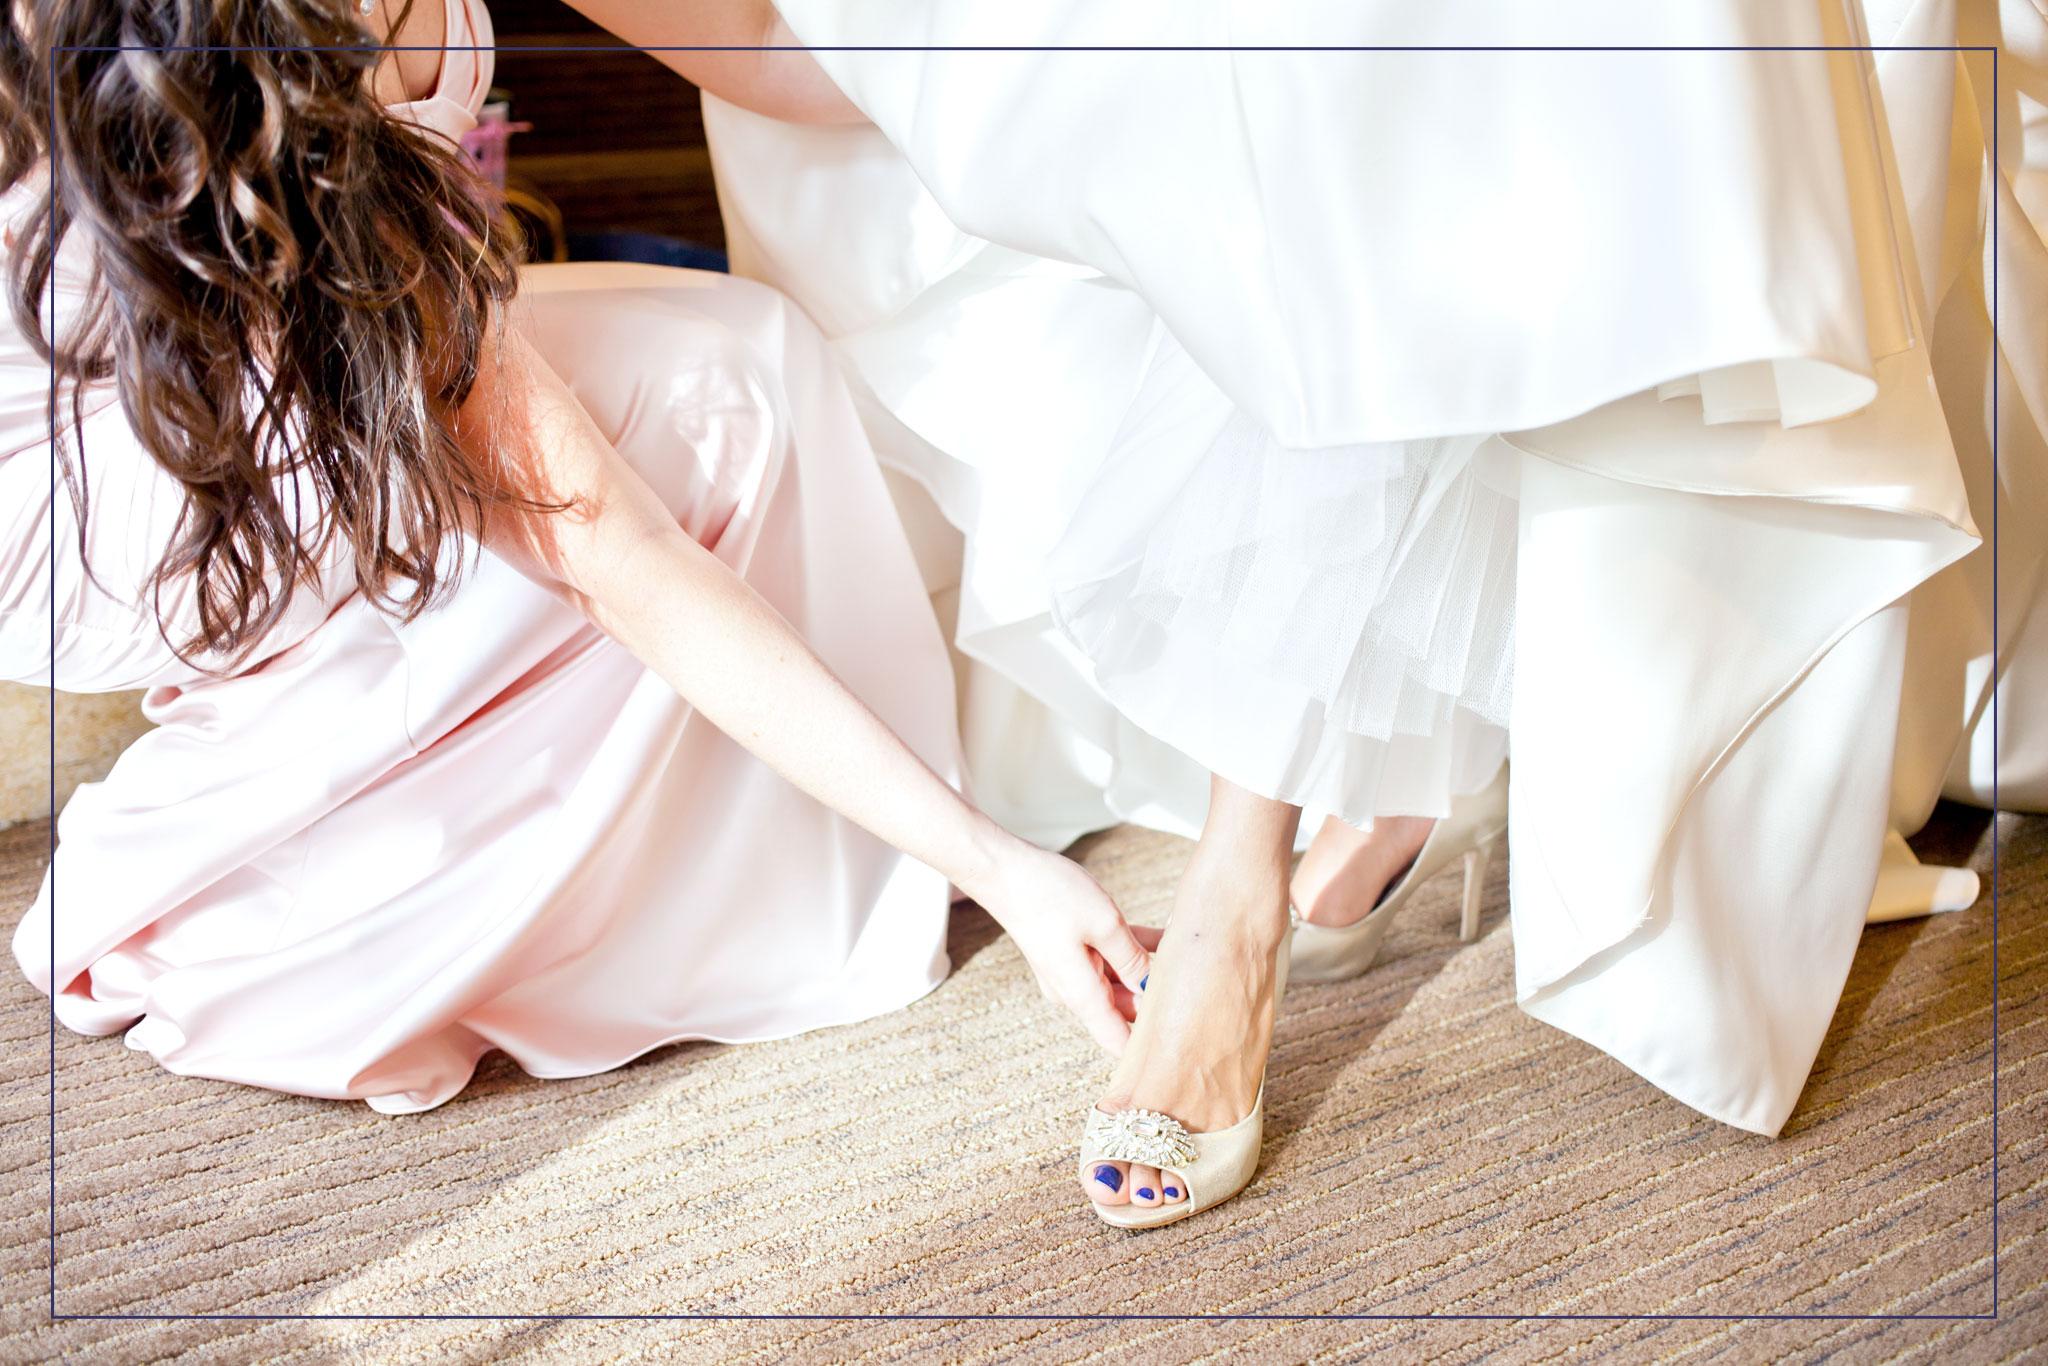 teresa-valencia-photography-scottsdale-plaza-resort-wedding-getting-ready.jpg